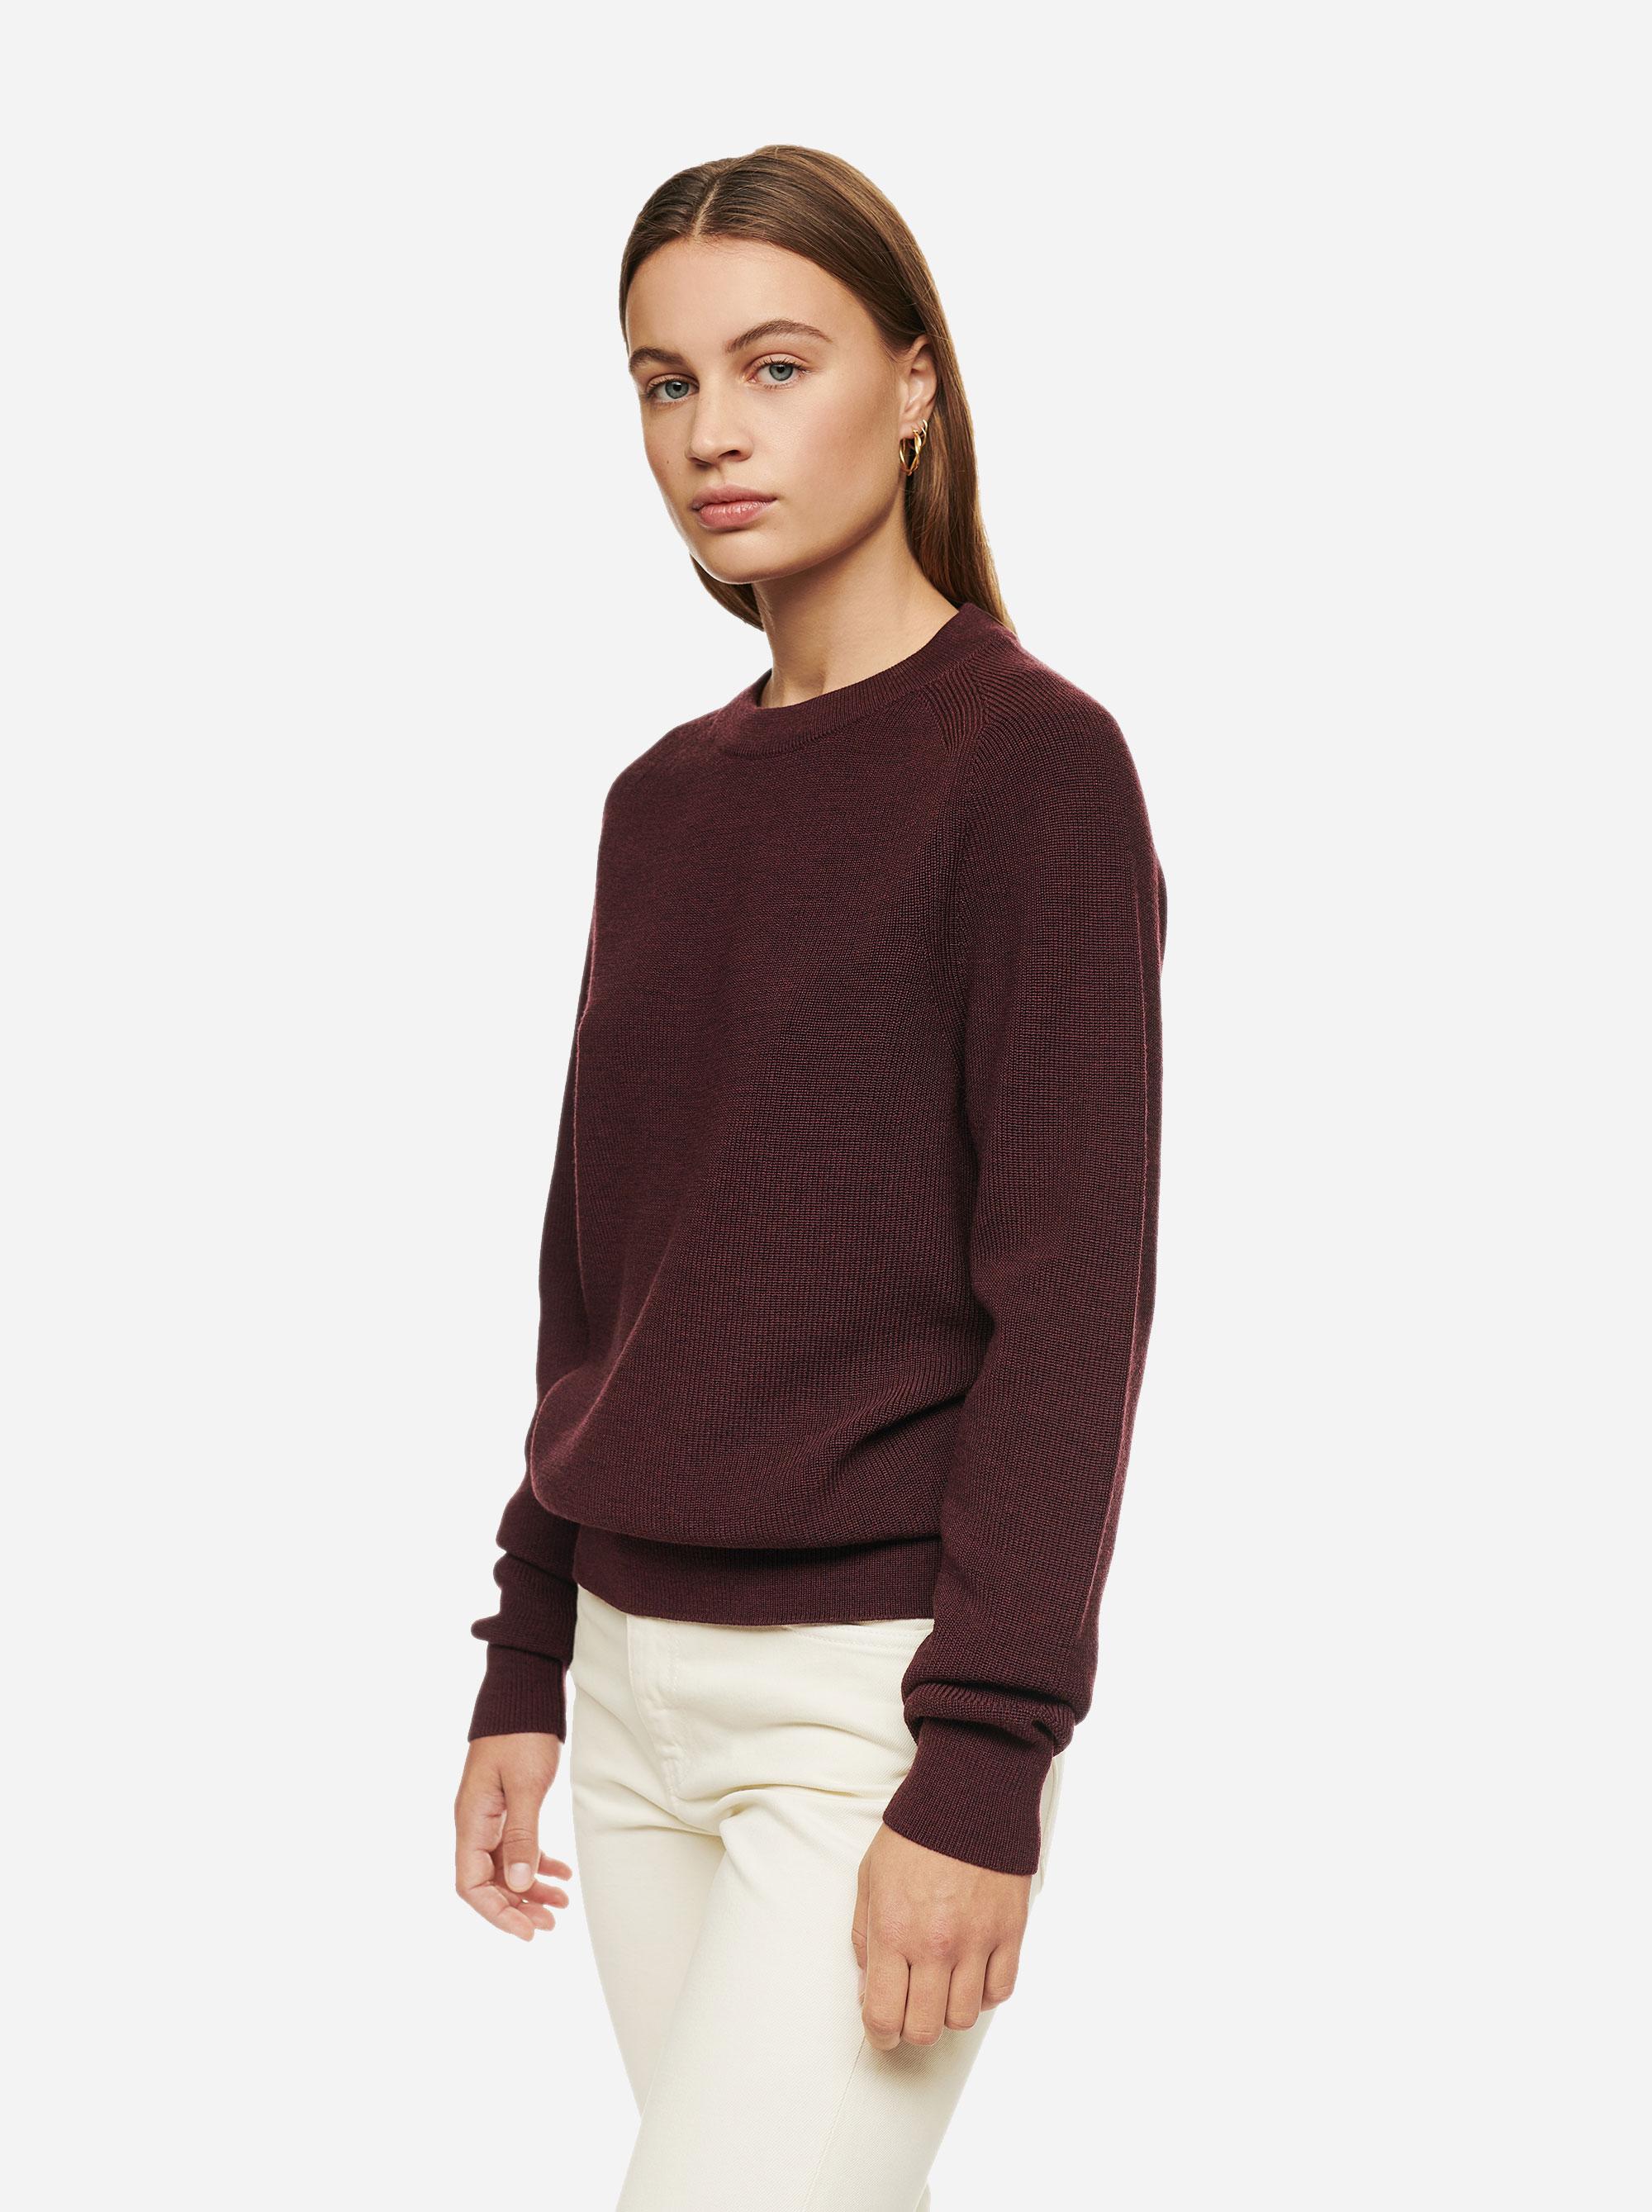 Teym - Crewneck - The Merino Sweater - Women - Burgundy - 2